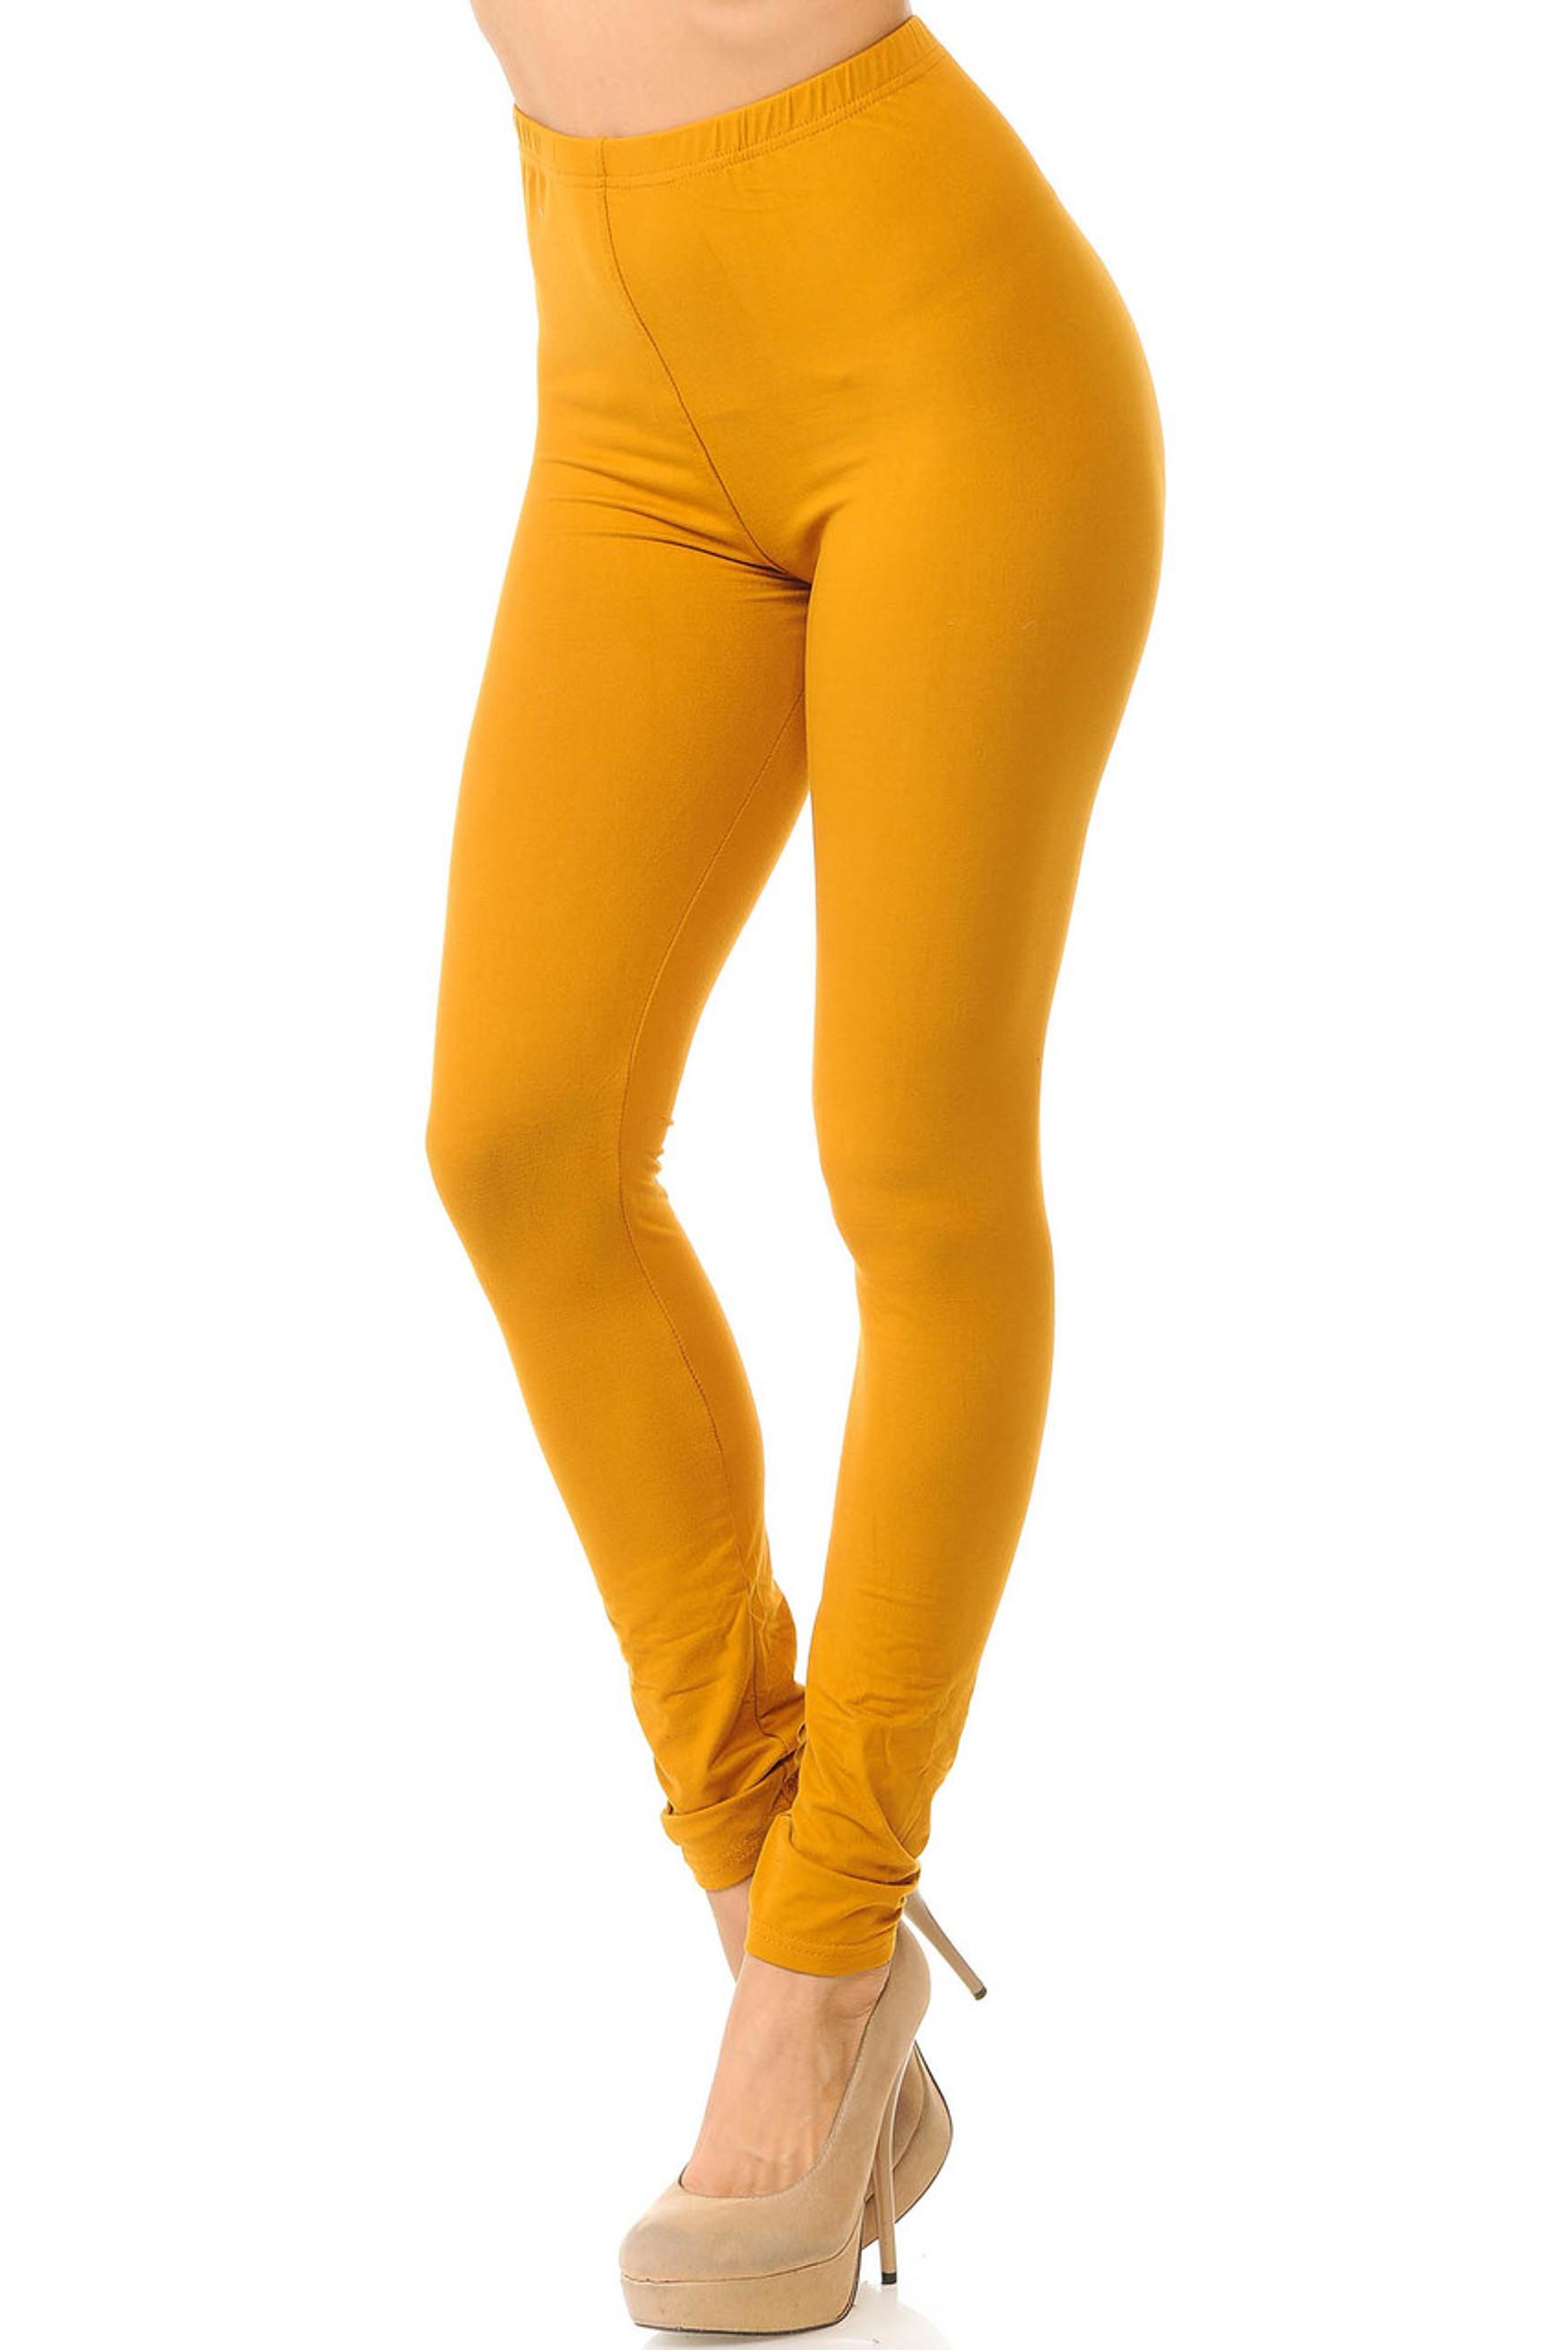 Mustard Brushed Basic Solid Leggings - New Mix